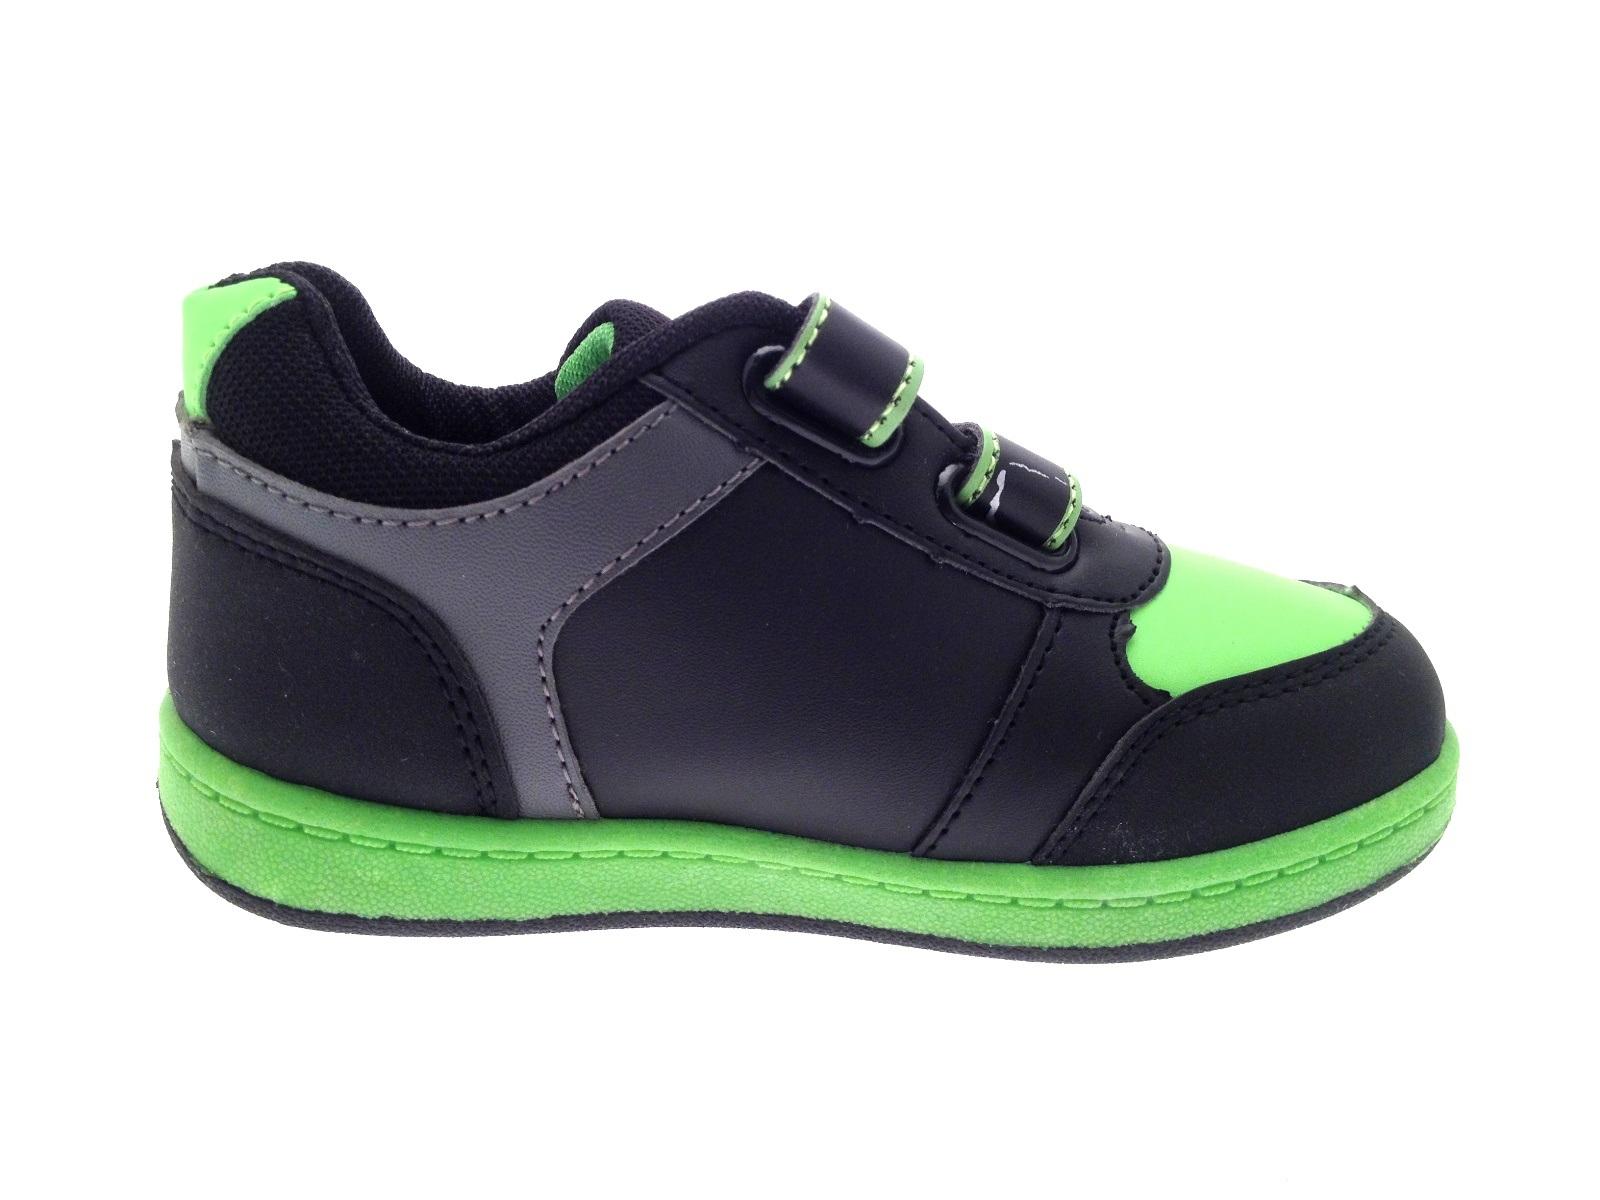 Skate shoes uk - Kids Boys Teenage Mutant Ninja Turtles Shoes Character Skate Trainers Size